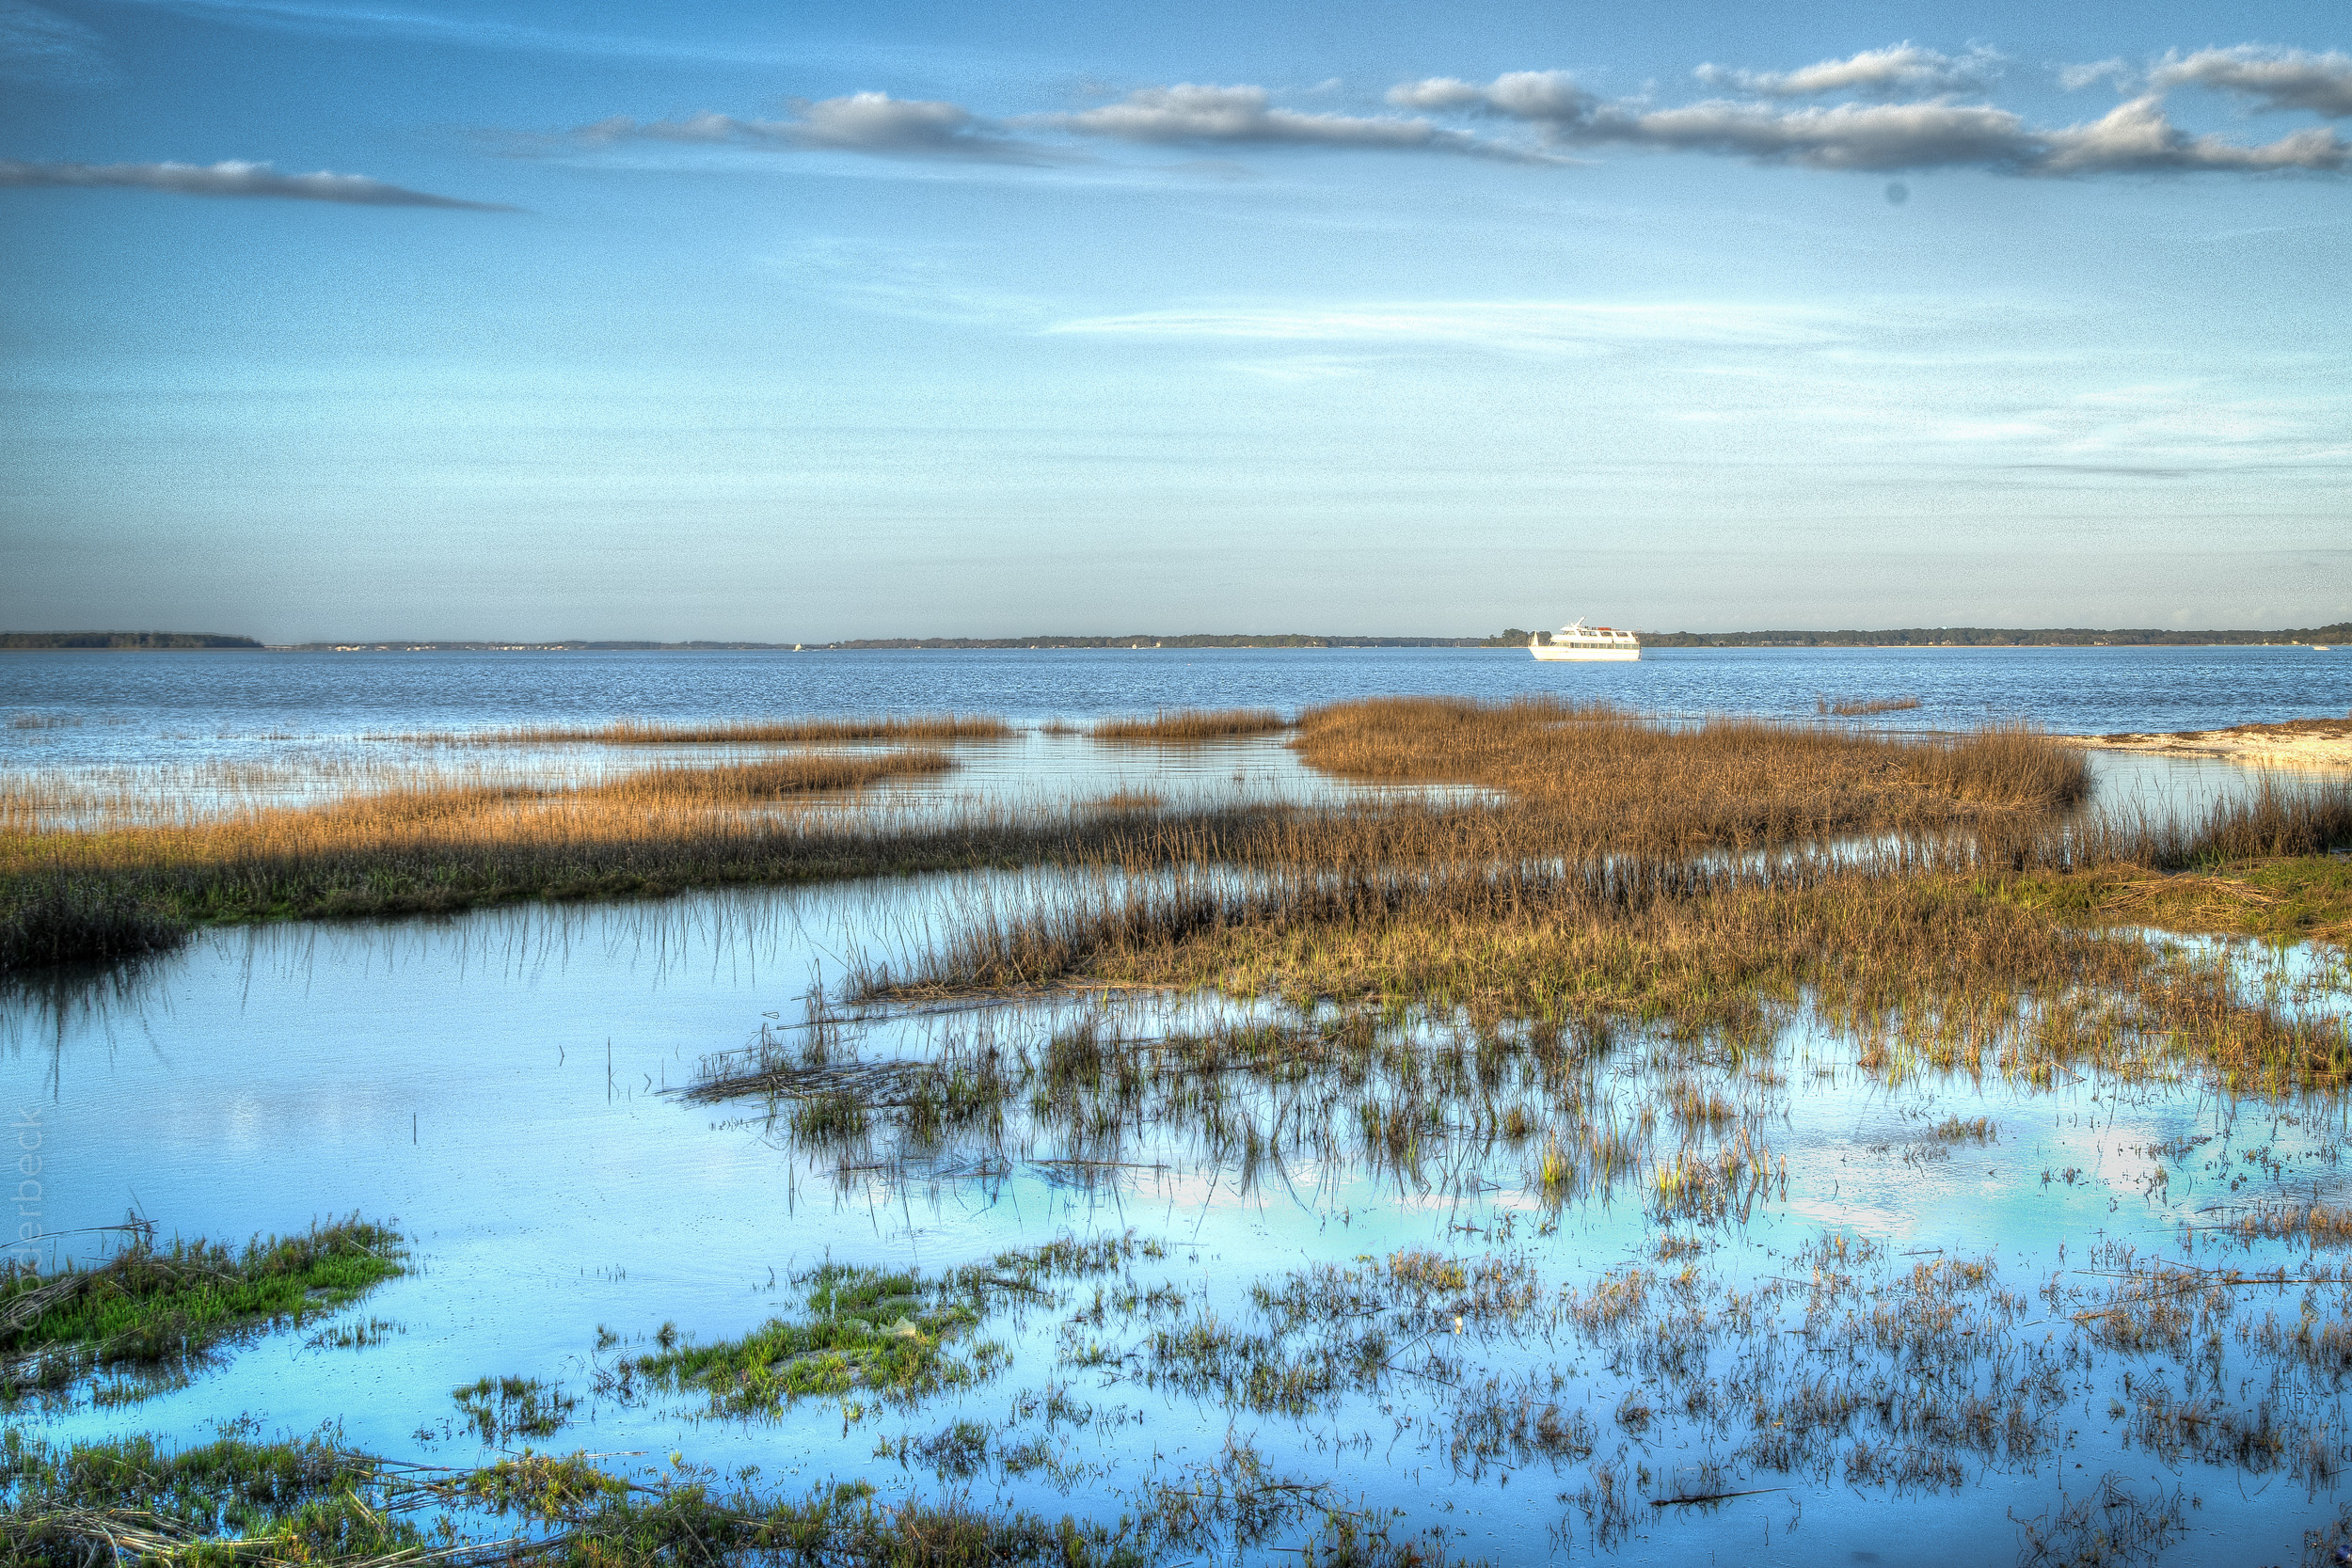 high-tide-marsh-ocean-boat.jpg